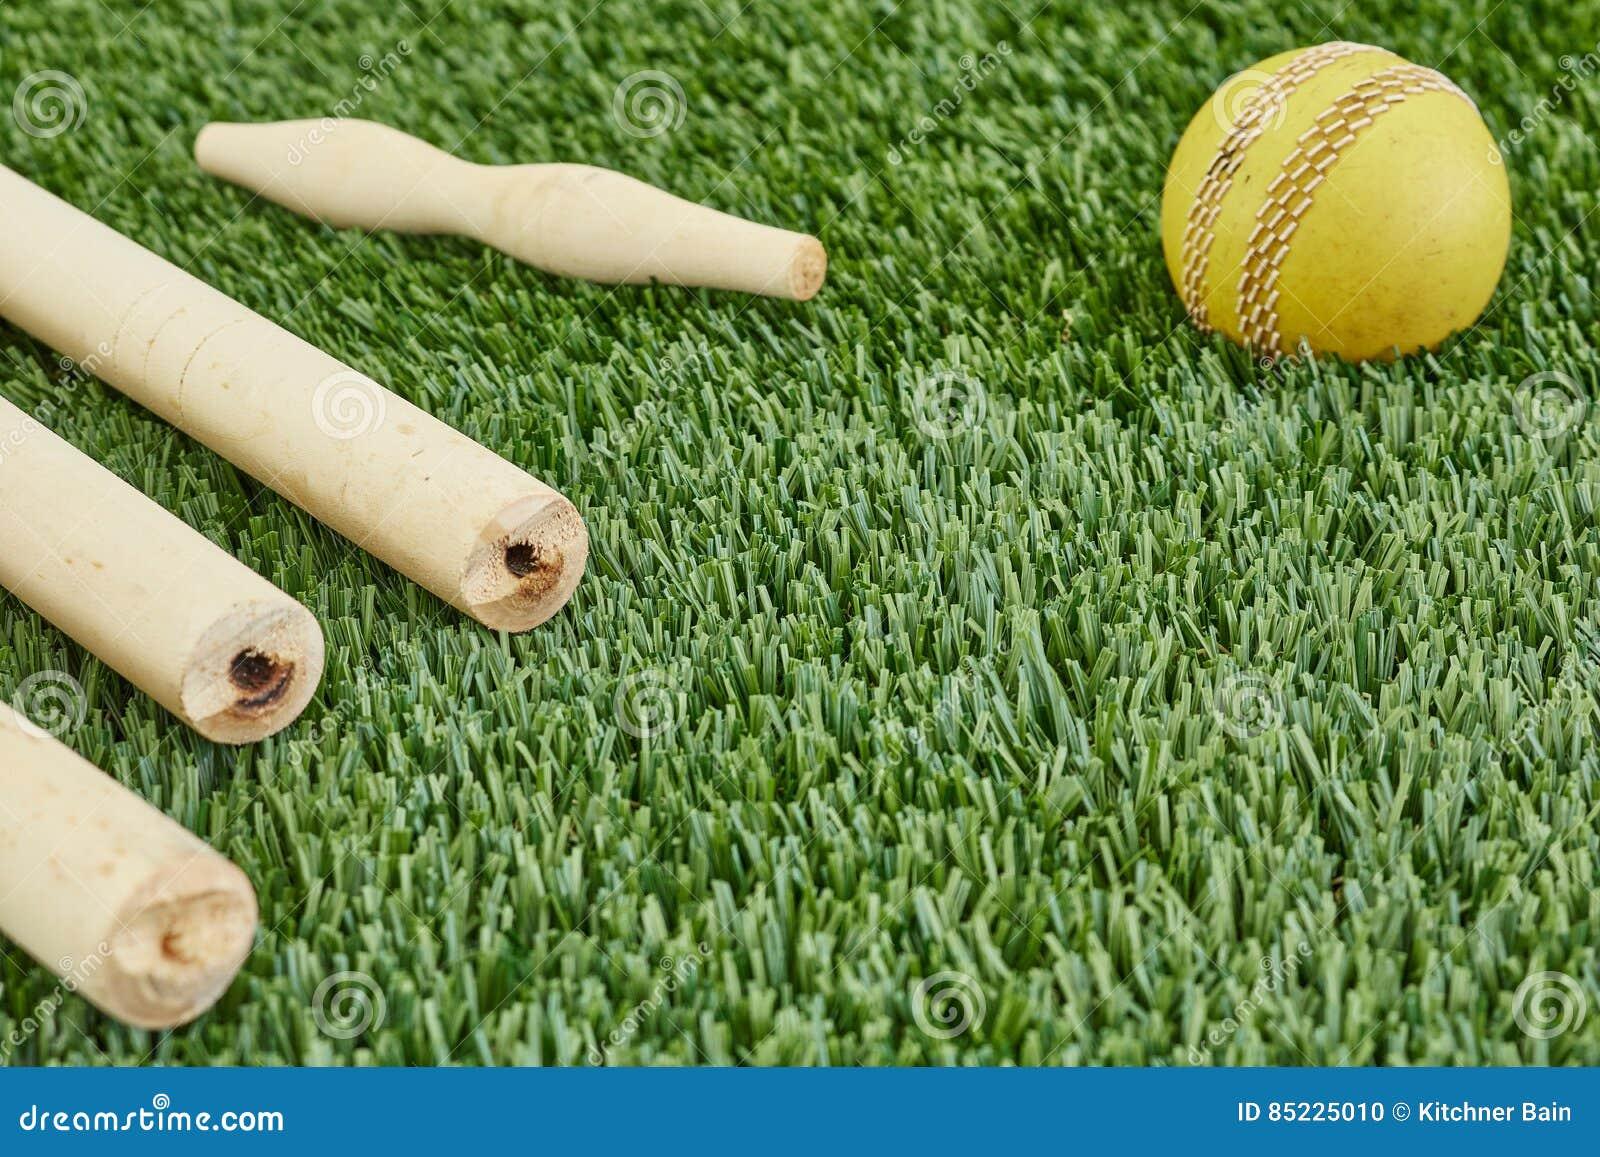 cricket-equipment-studio-photo-gear-grass-85225010.jpg